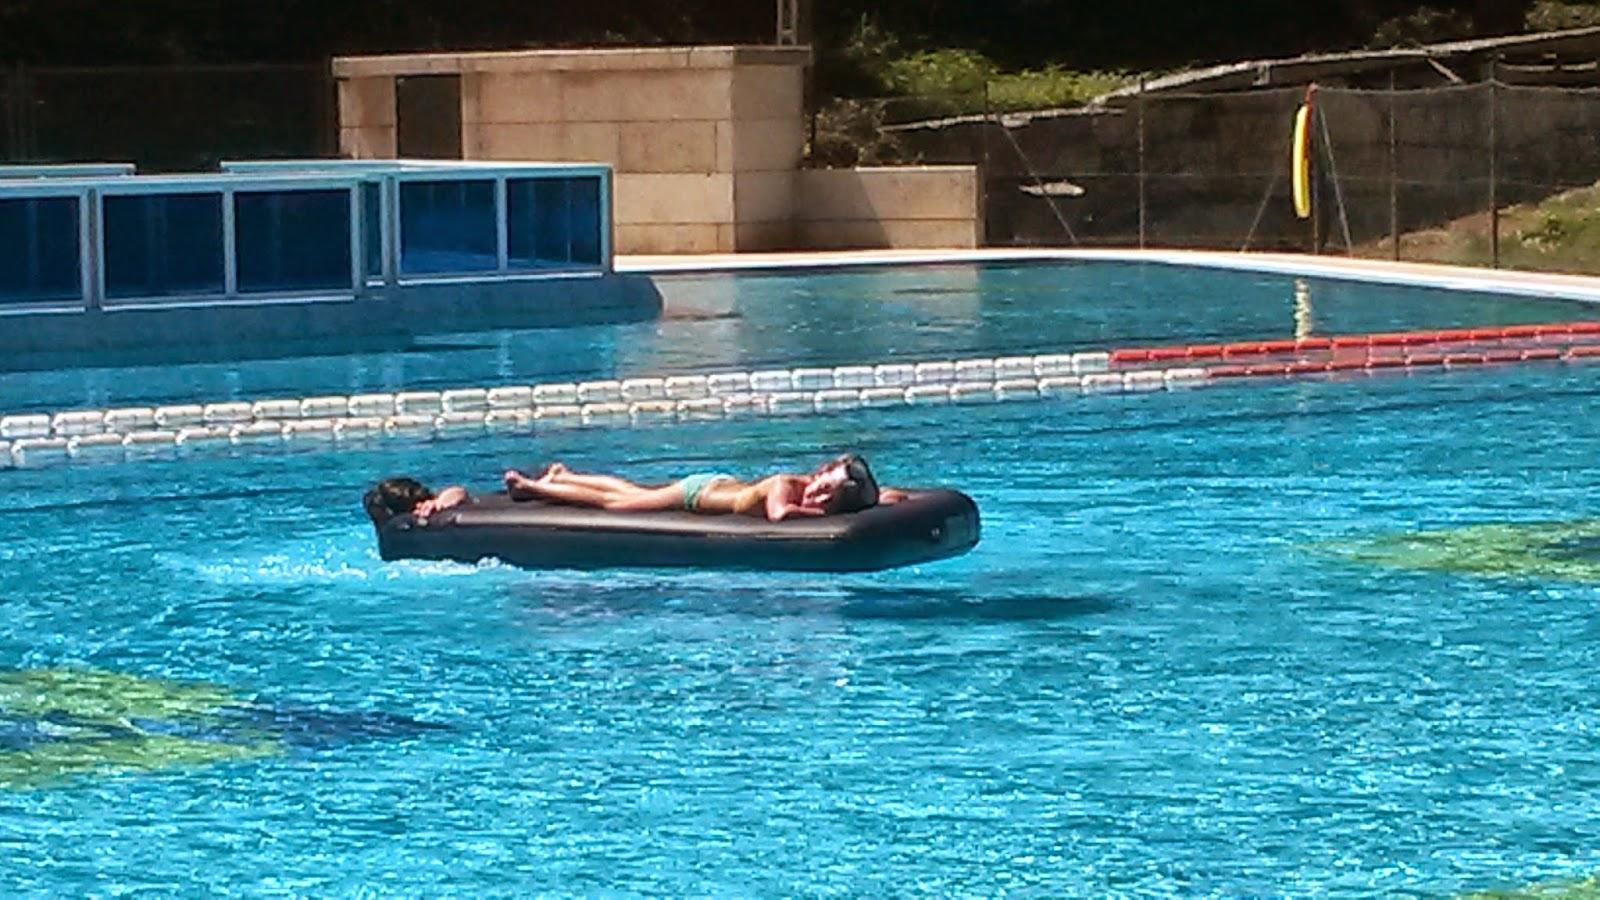 Piscinas al aire libre vigopeques for Horario piscina alaquas